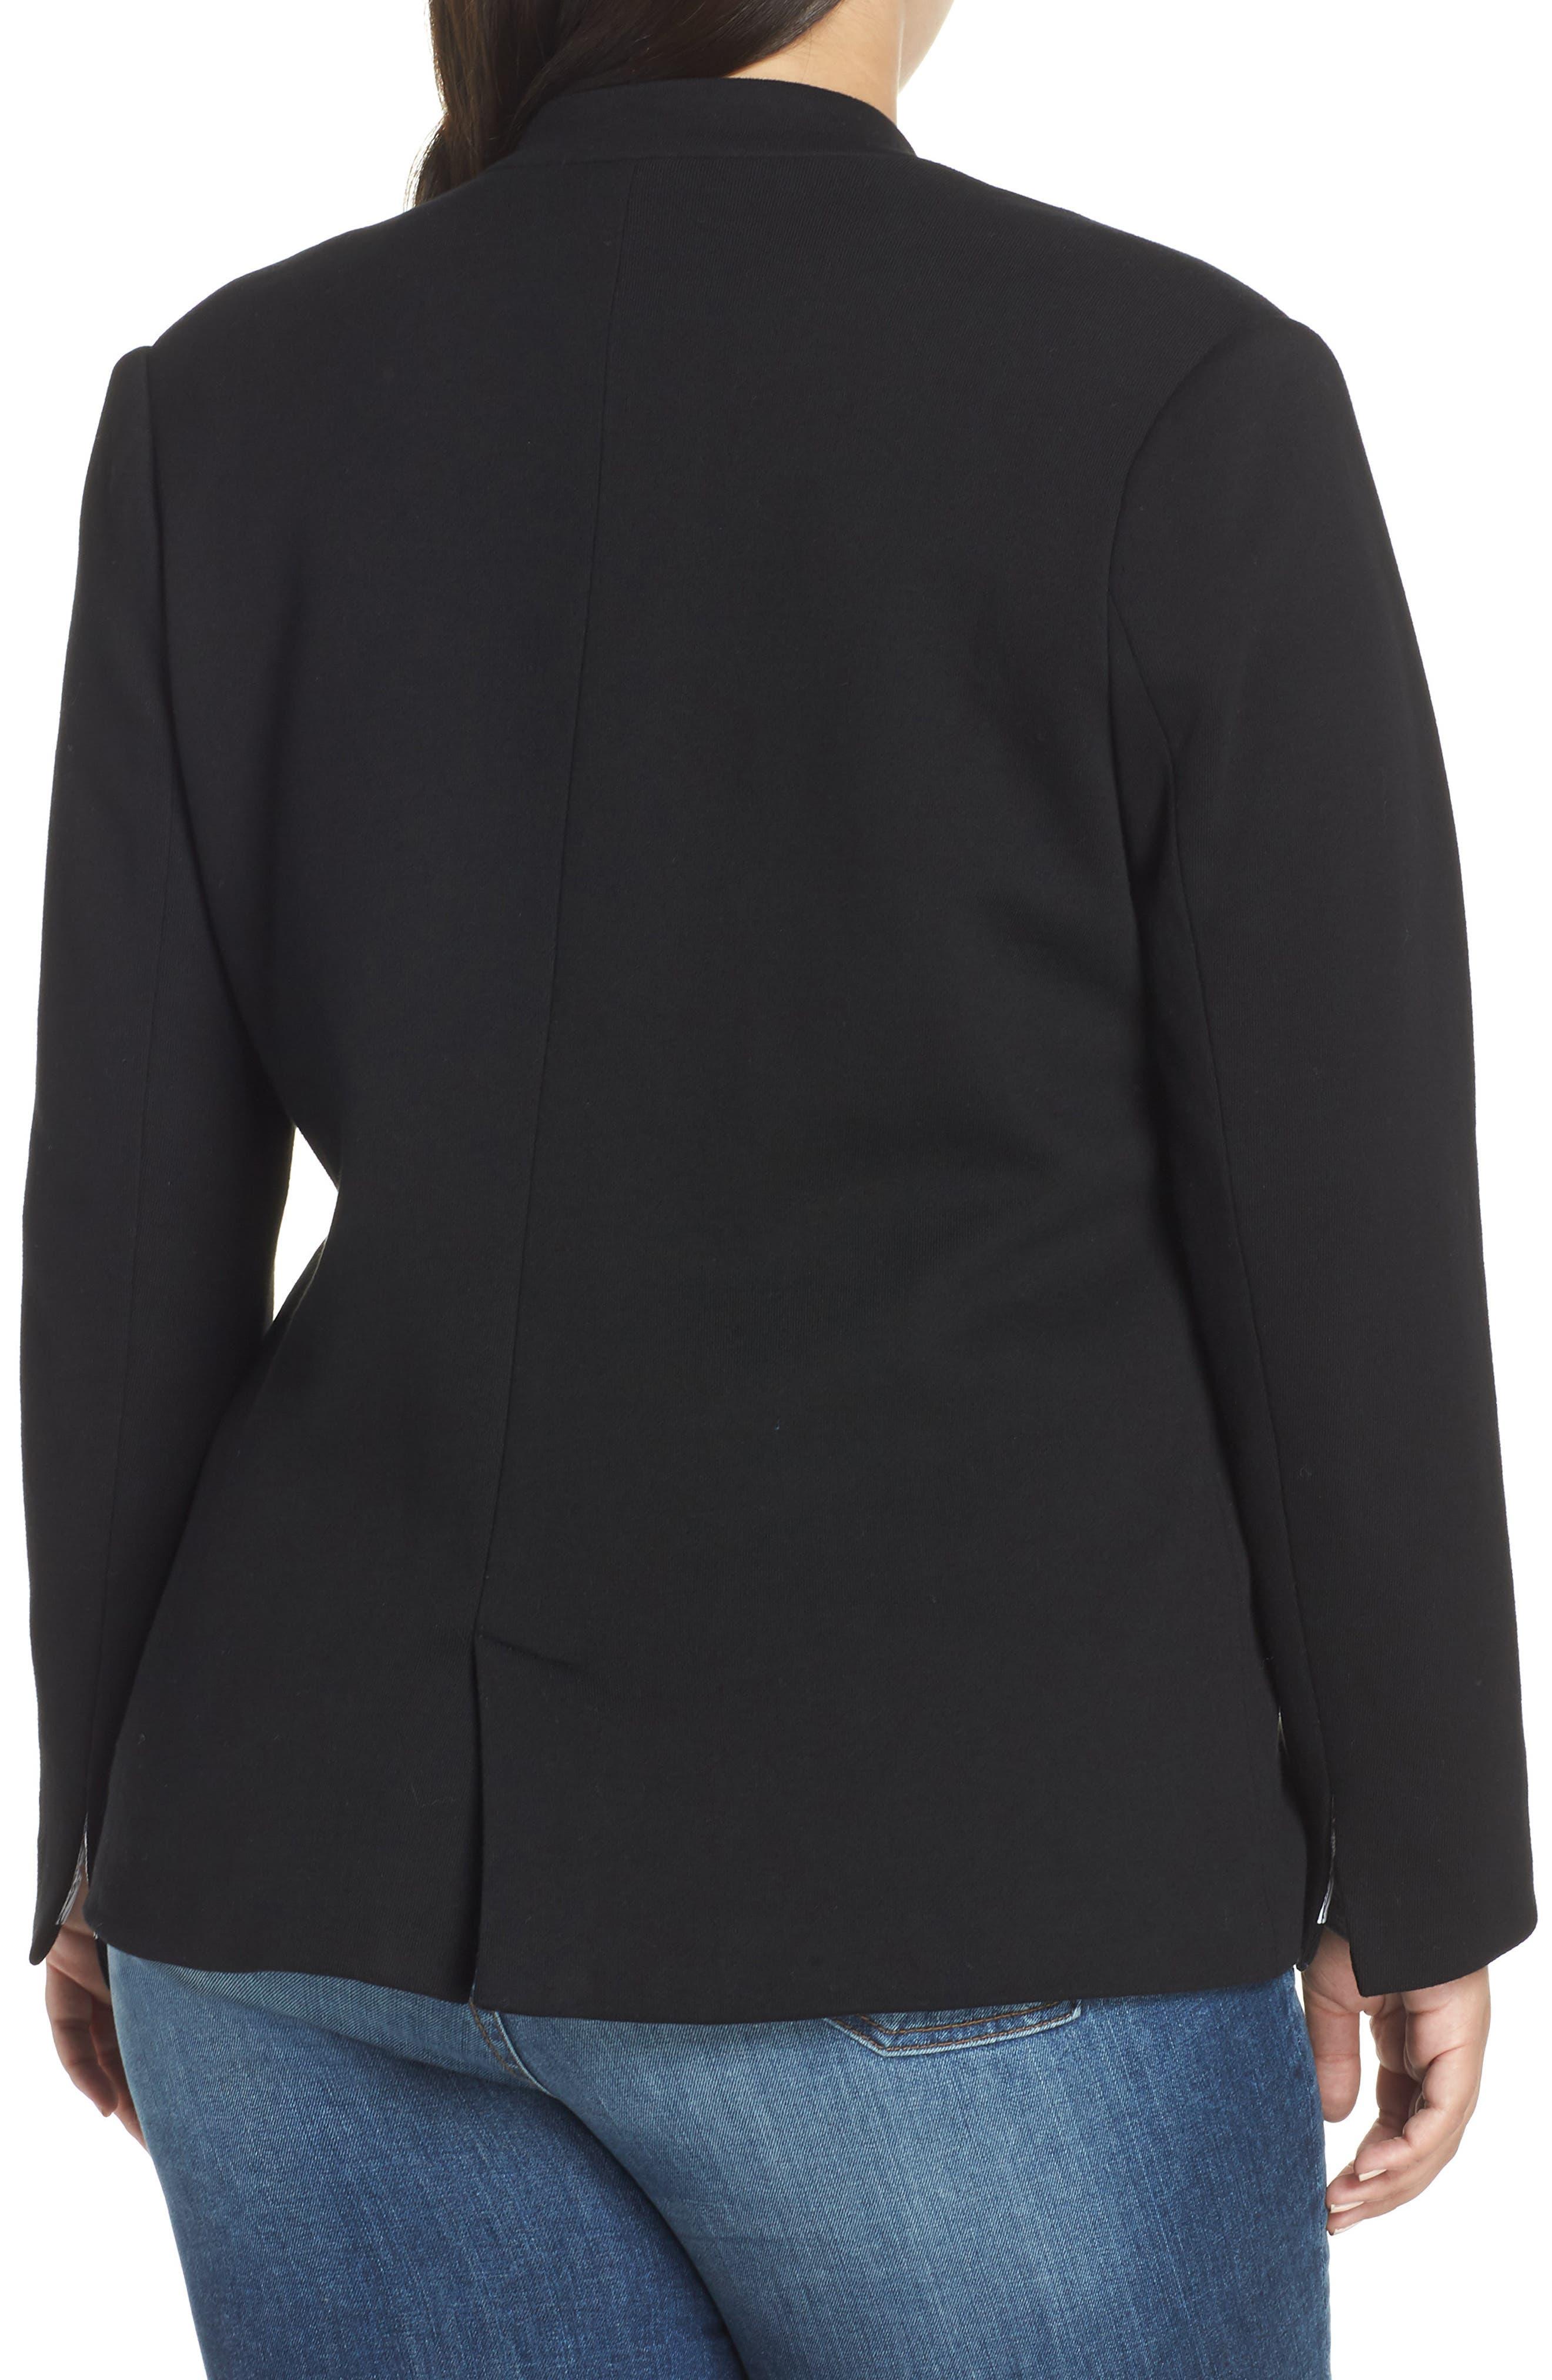 GIBSON,                             Inverted Notch Collar Cotton Blend Blazer,                             Alternate thumbnail 2, color,                             BLACK